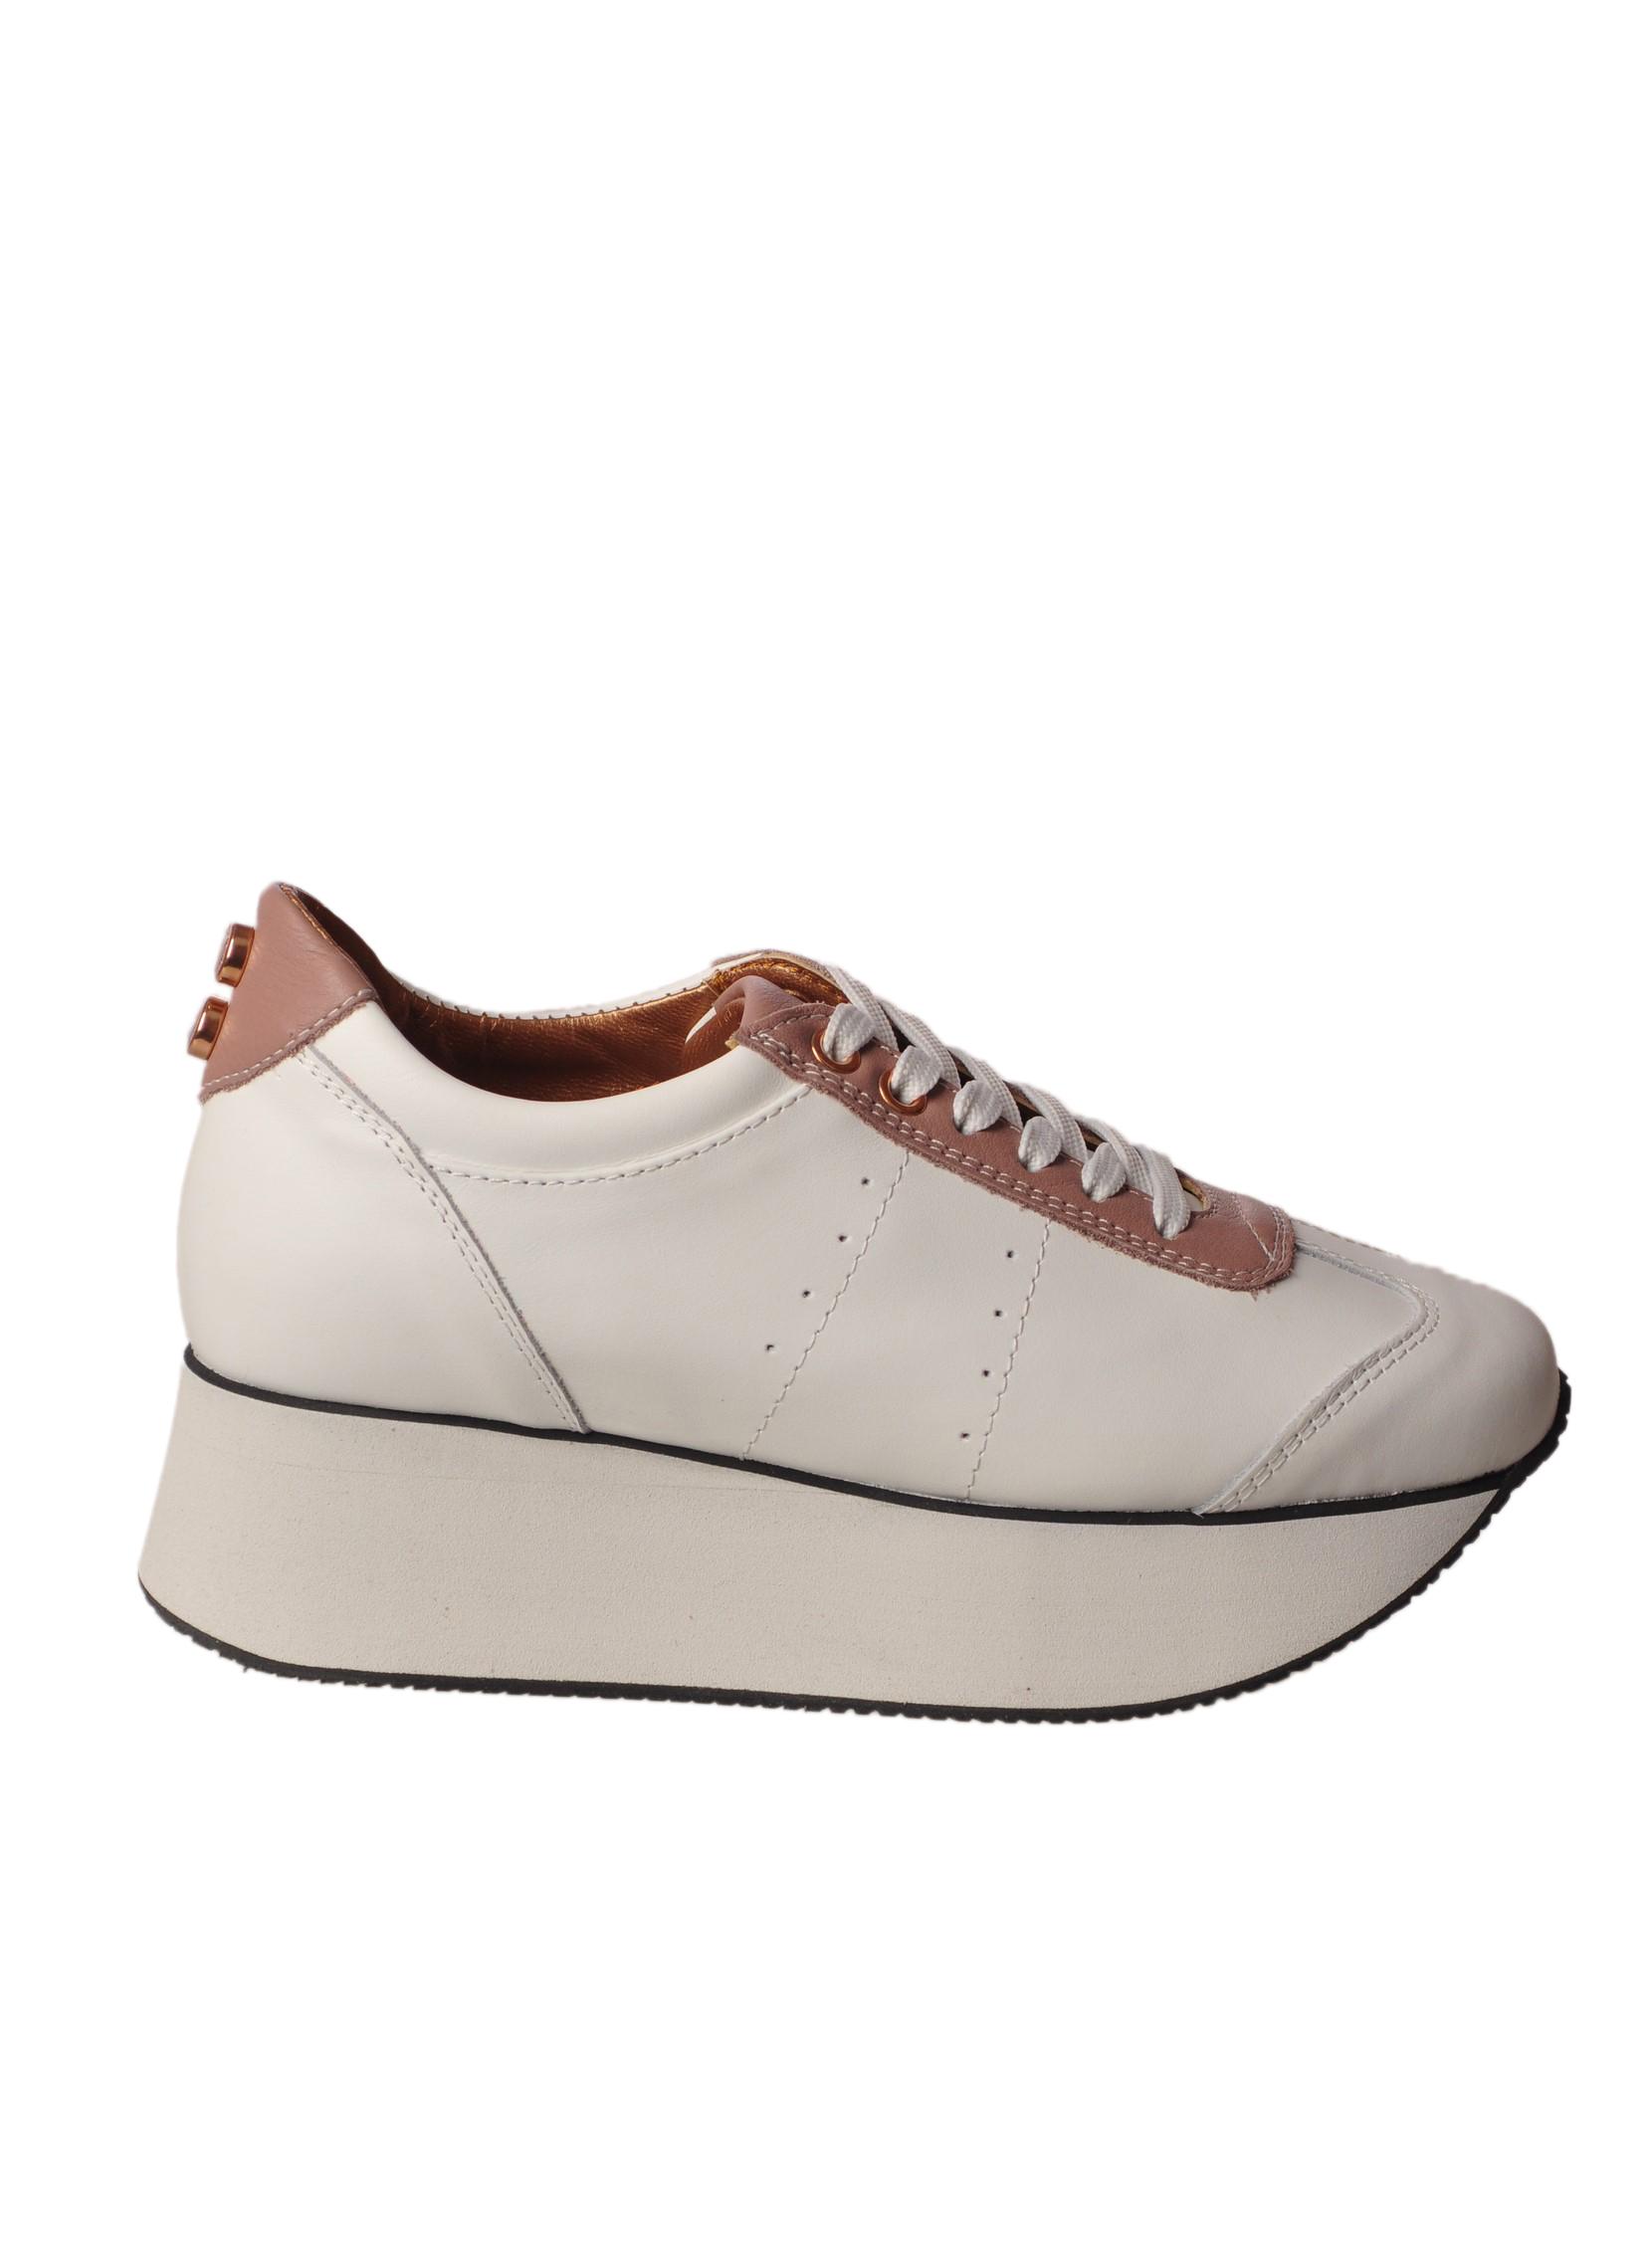 "Alexander Smith ""C42254"" Sneakers"